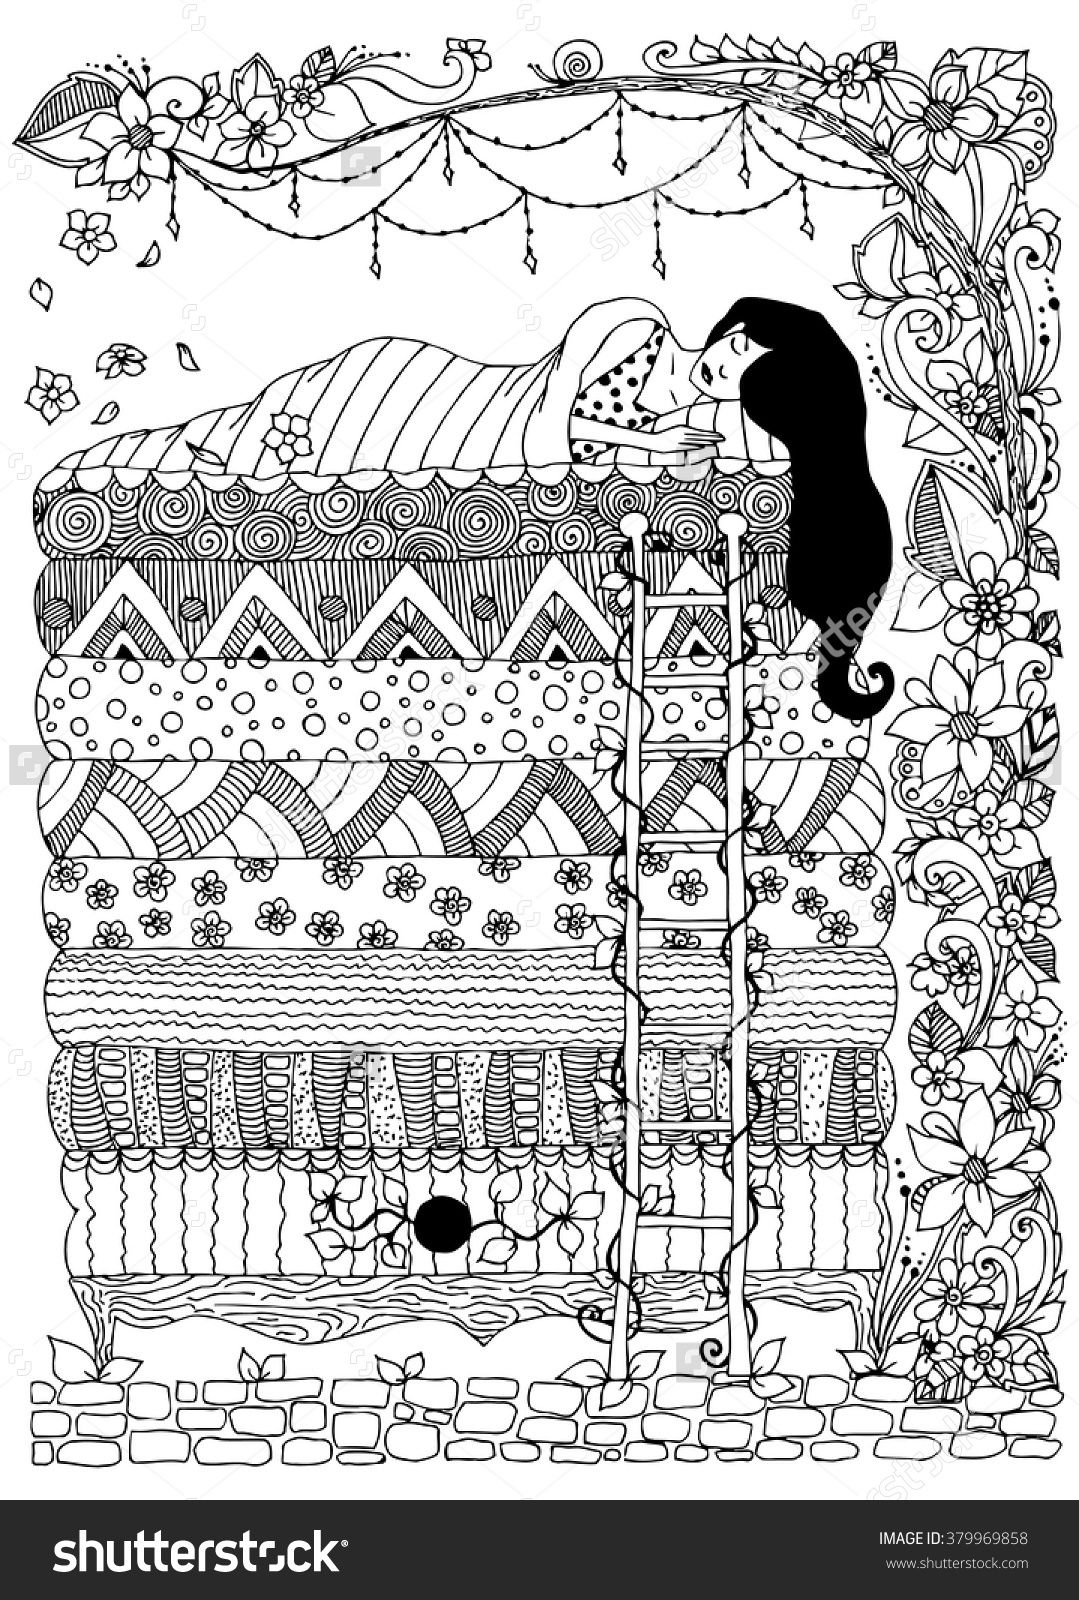 Princess And The Pea Zentangle Birthdays Pinterest Princess